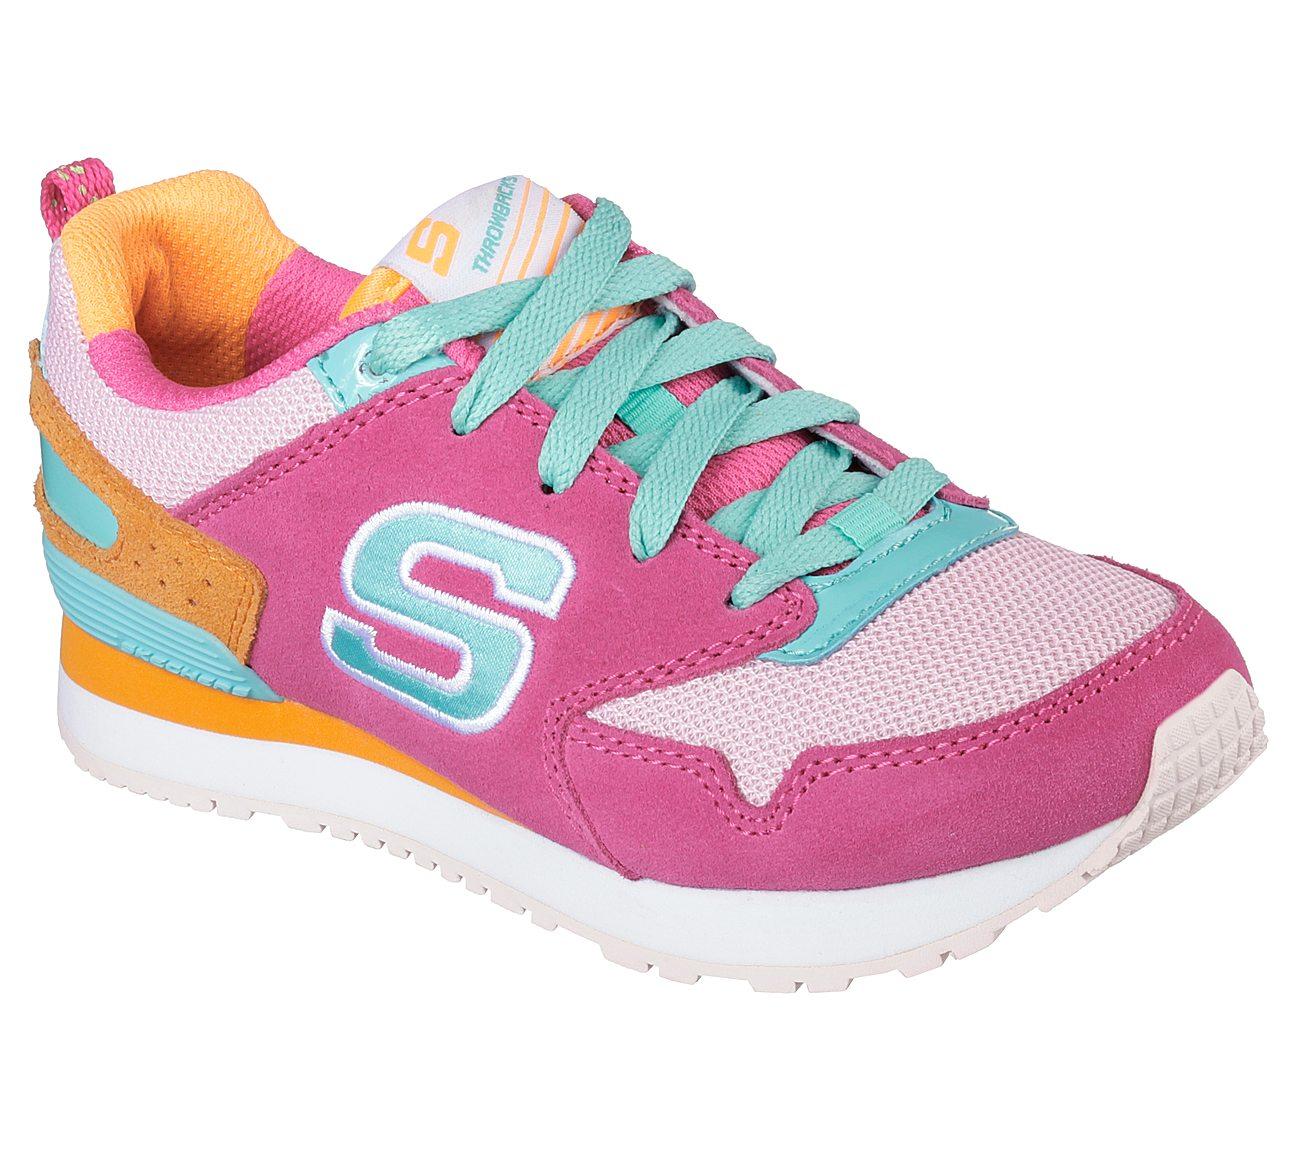 8f69aba84ab9 Buy SKECHERS Retrospect - Retro Racer SKECHERS Sport Shoes only £40.00